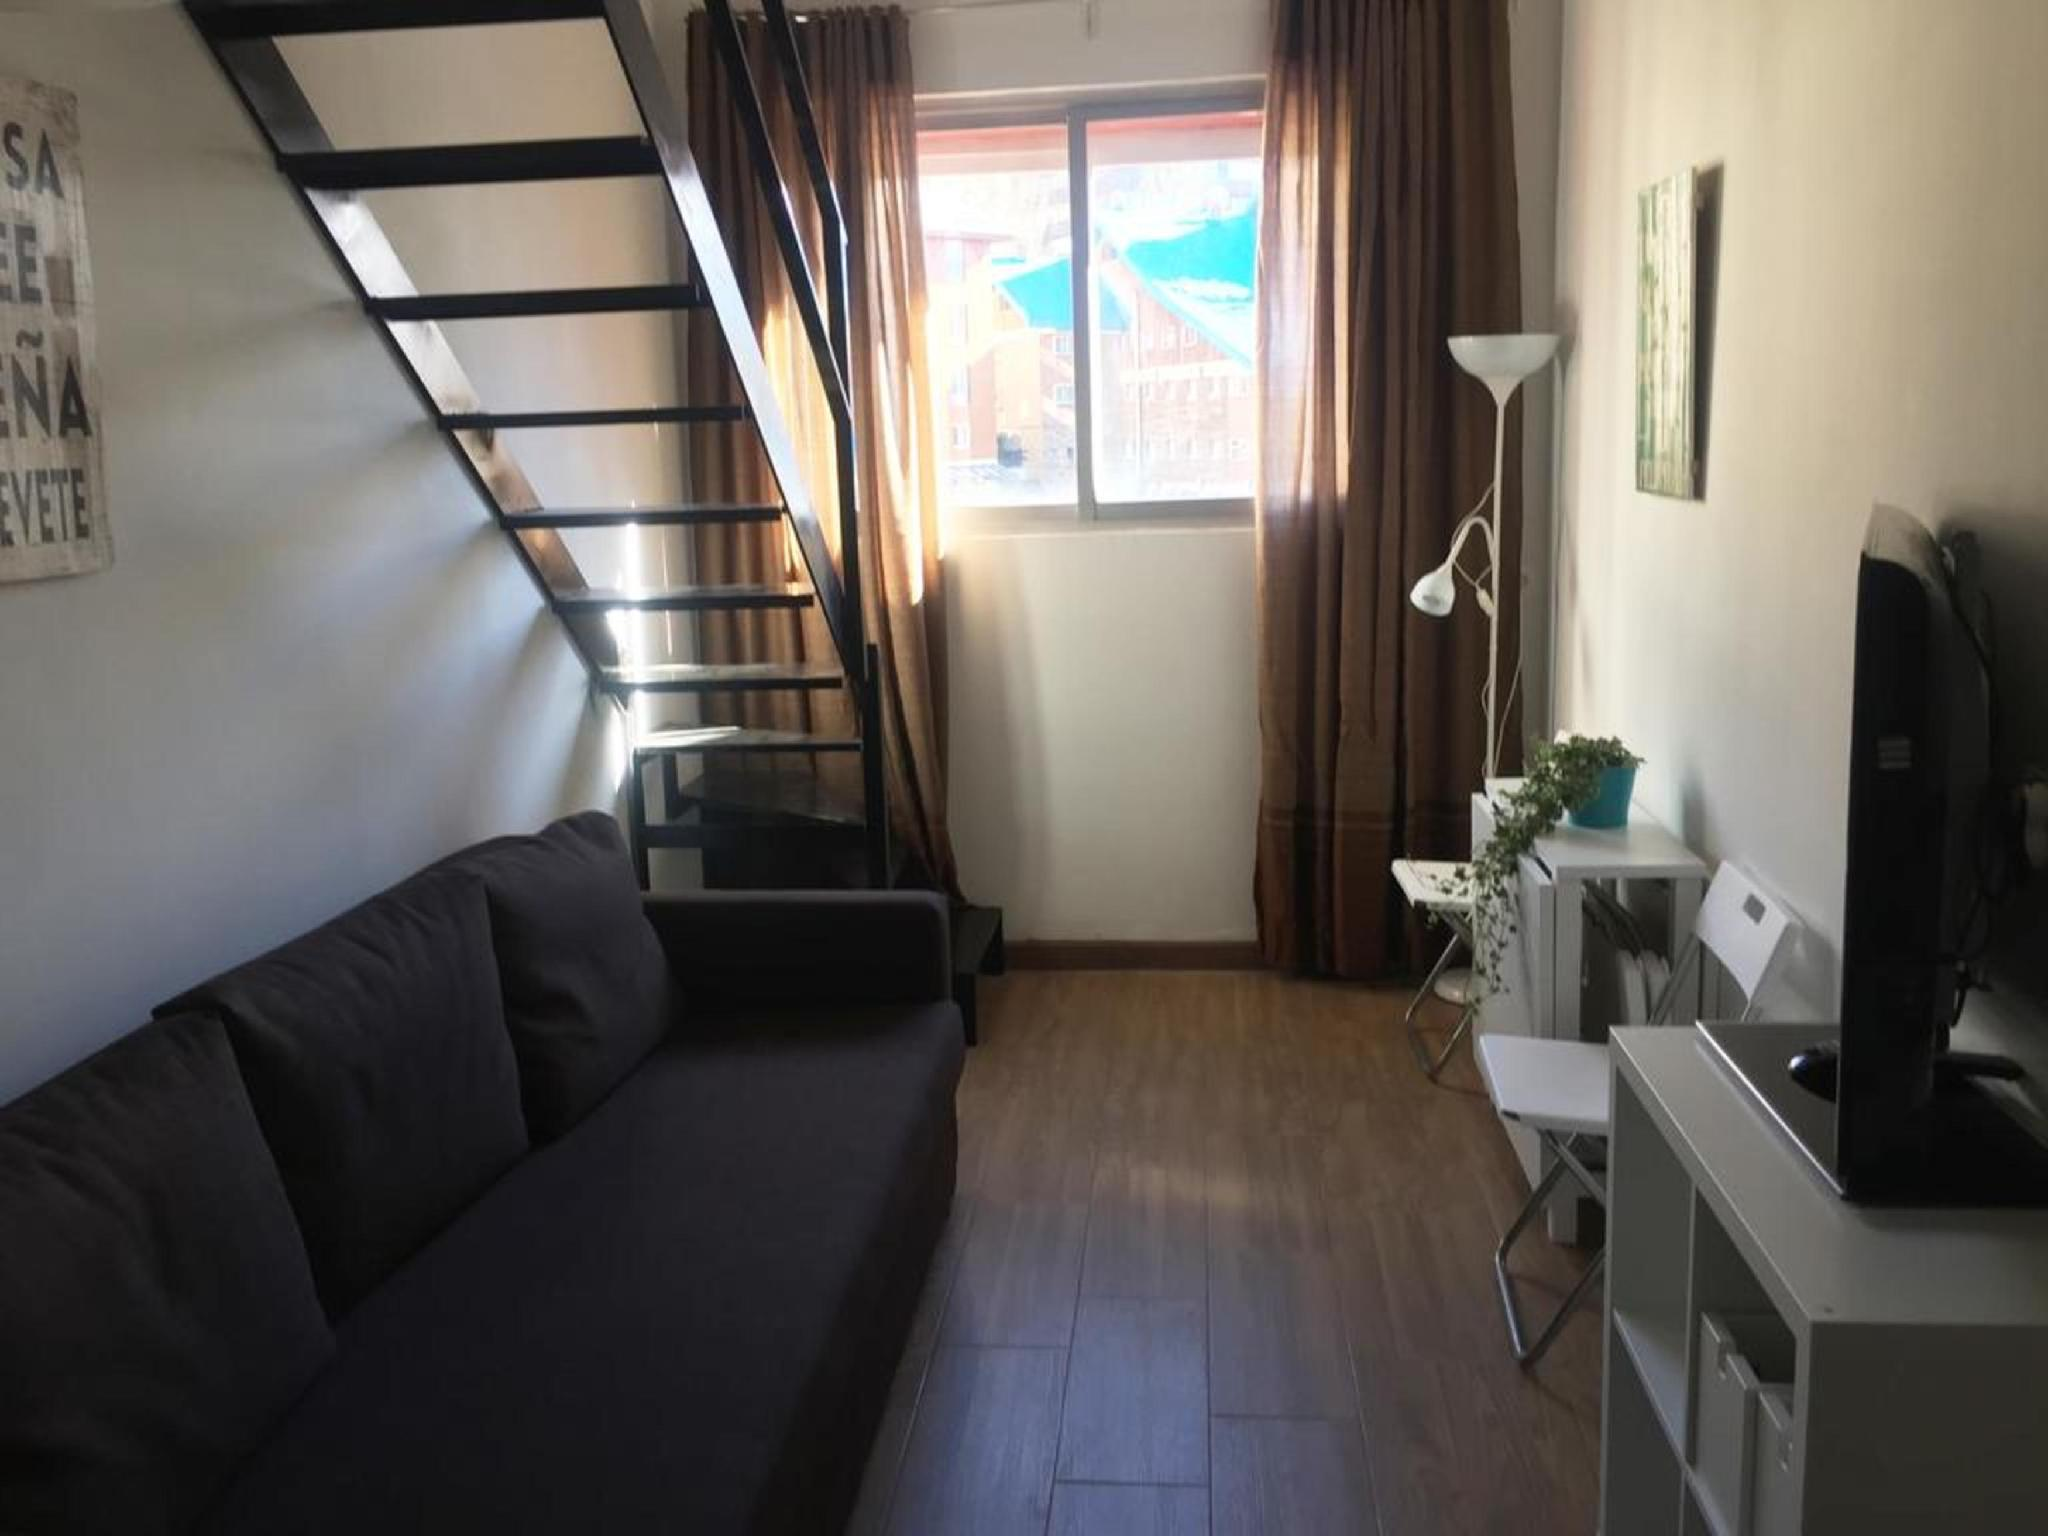 106880  Apartment In Sierra Nevada